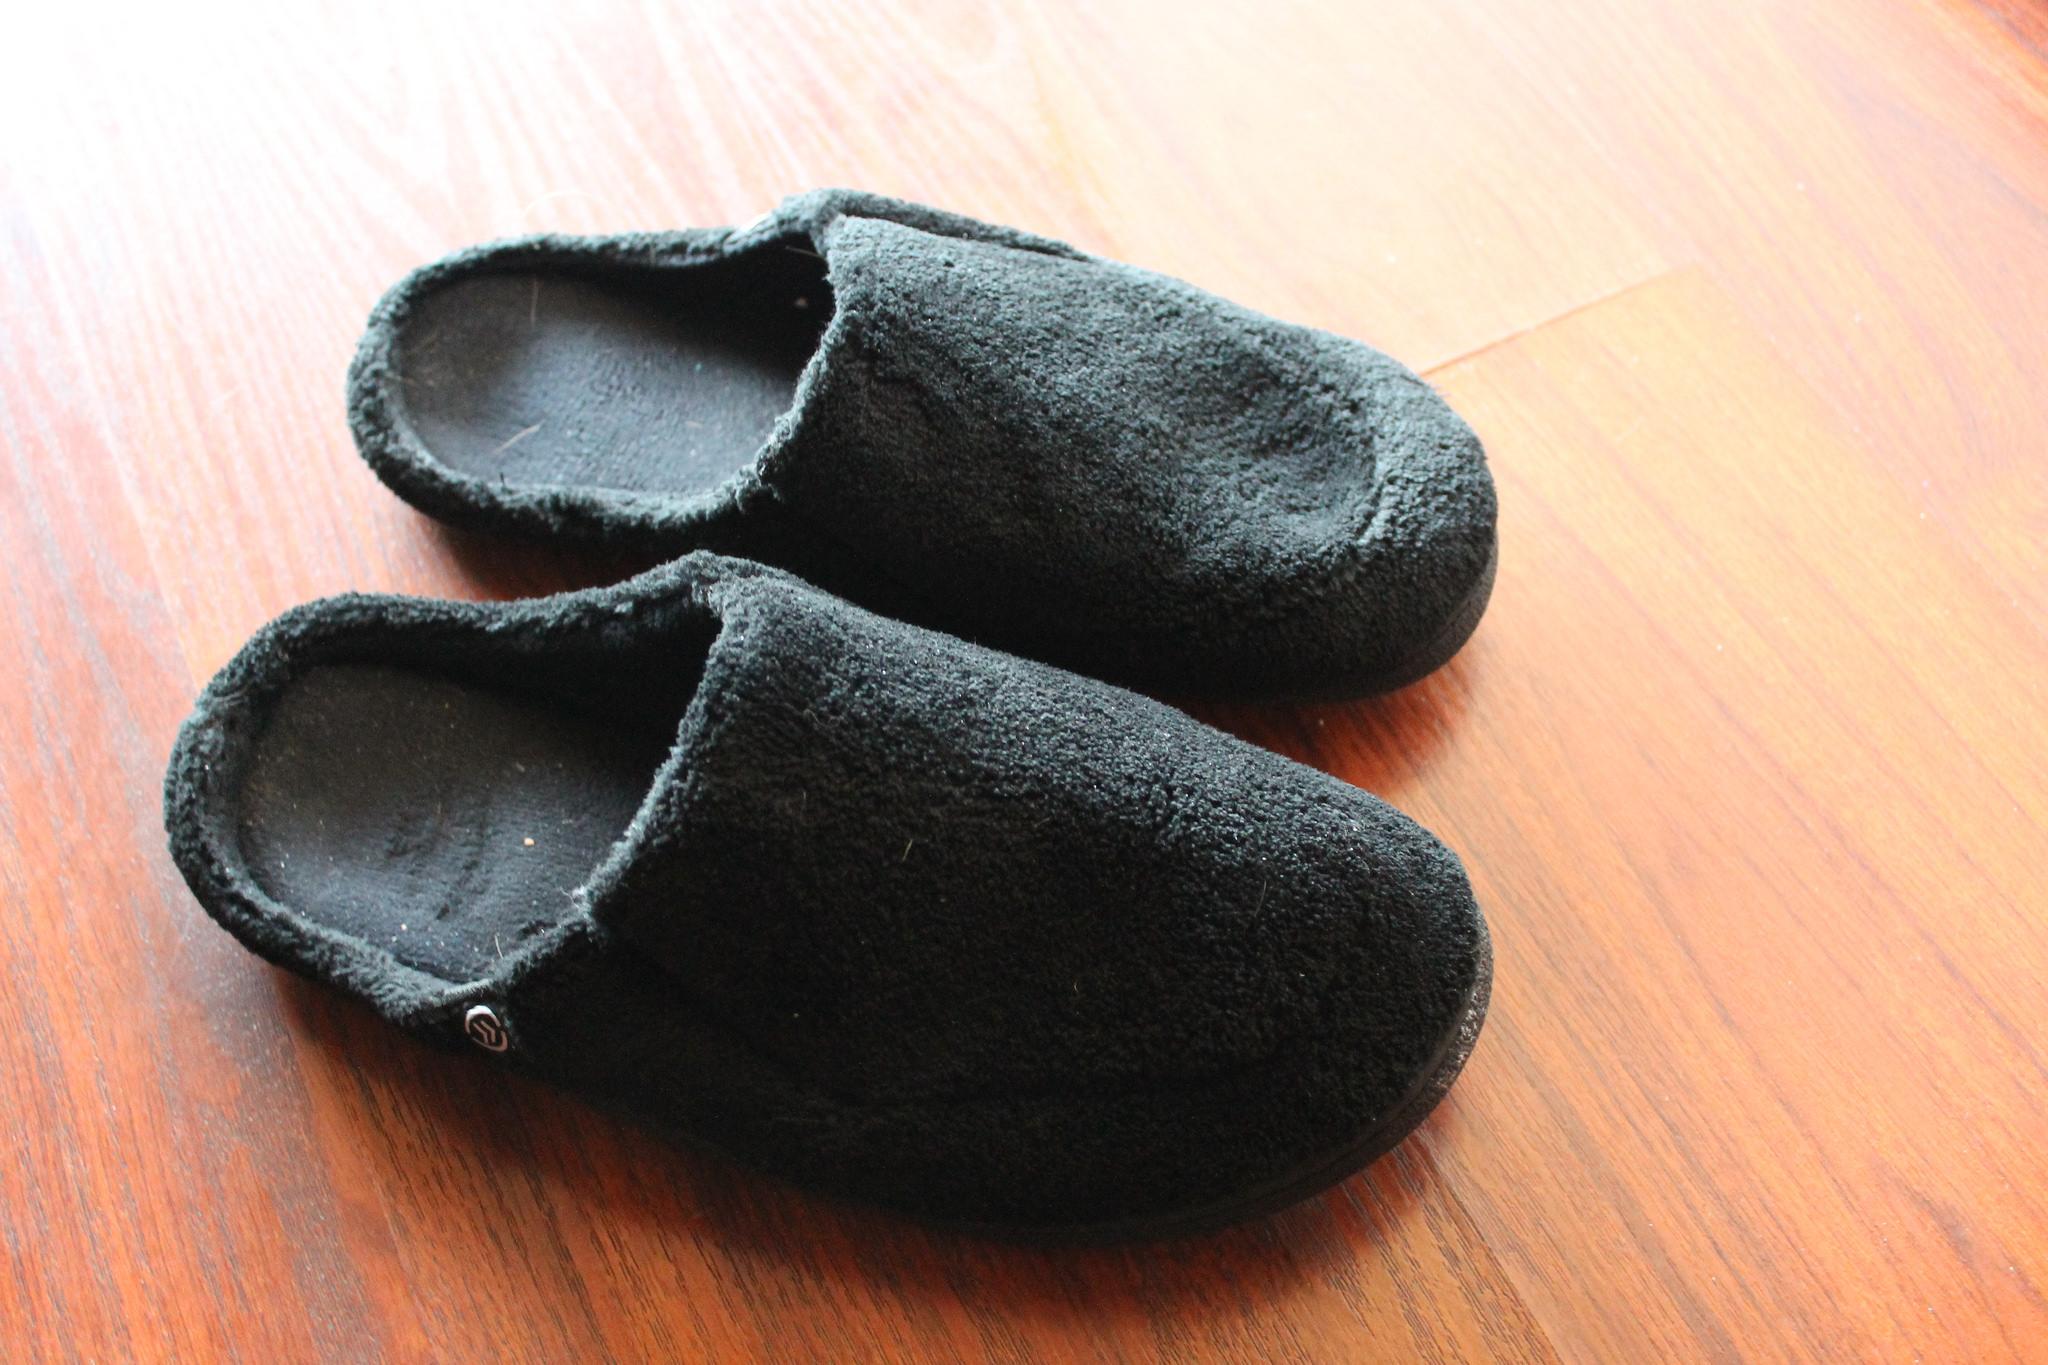 Winemaker David Scheidt's driving slippers...for road trips over 4 hours